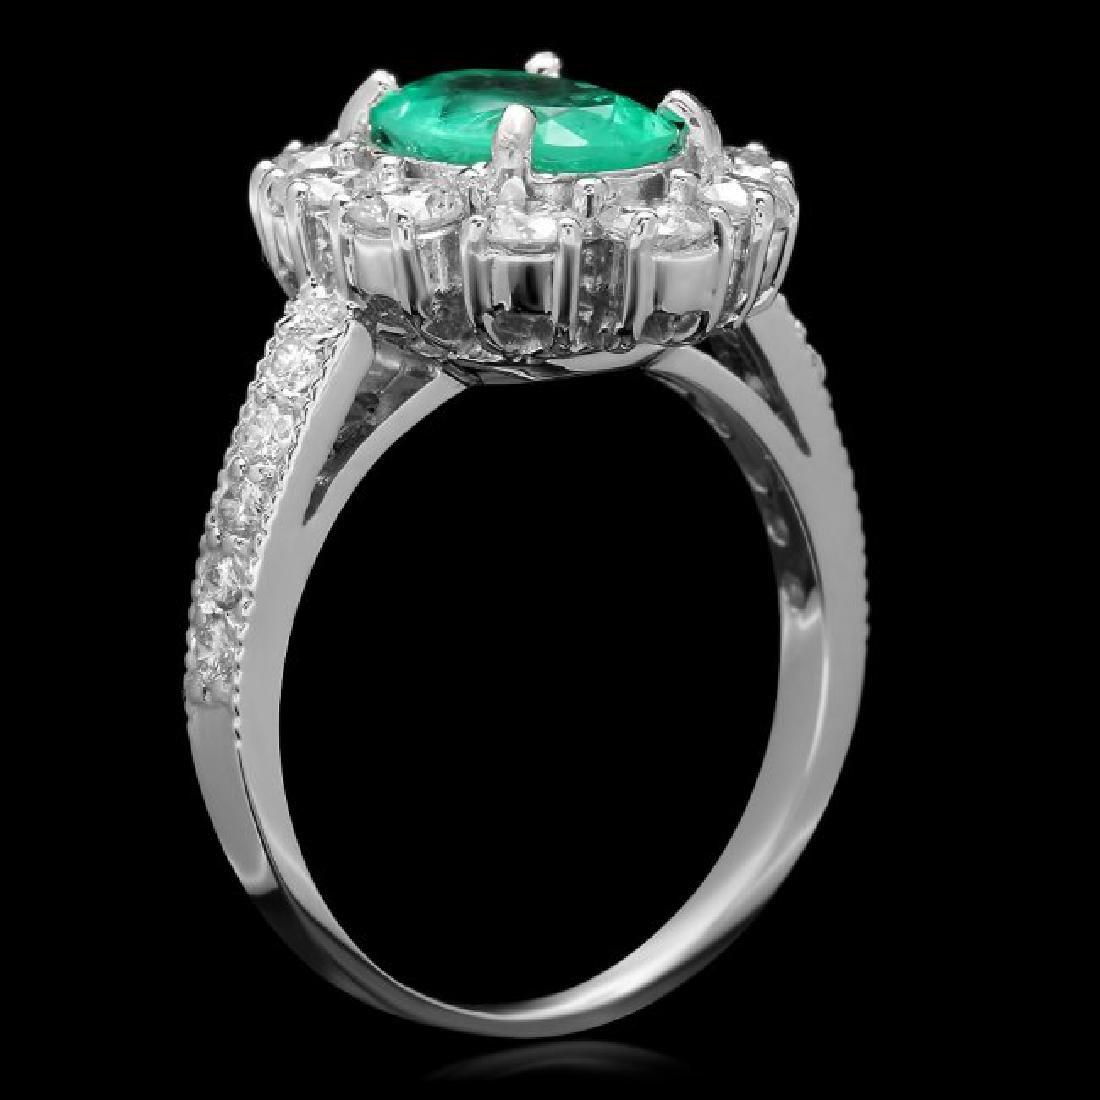 14k White Gold 1.50ct Emerald 1.45ct Diamond Ring - 2